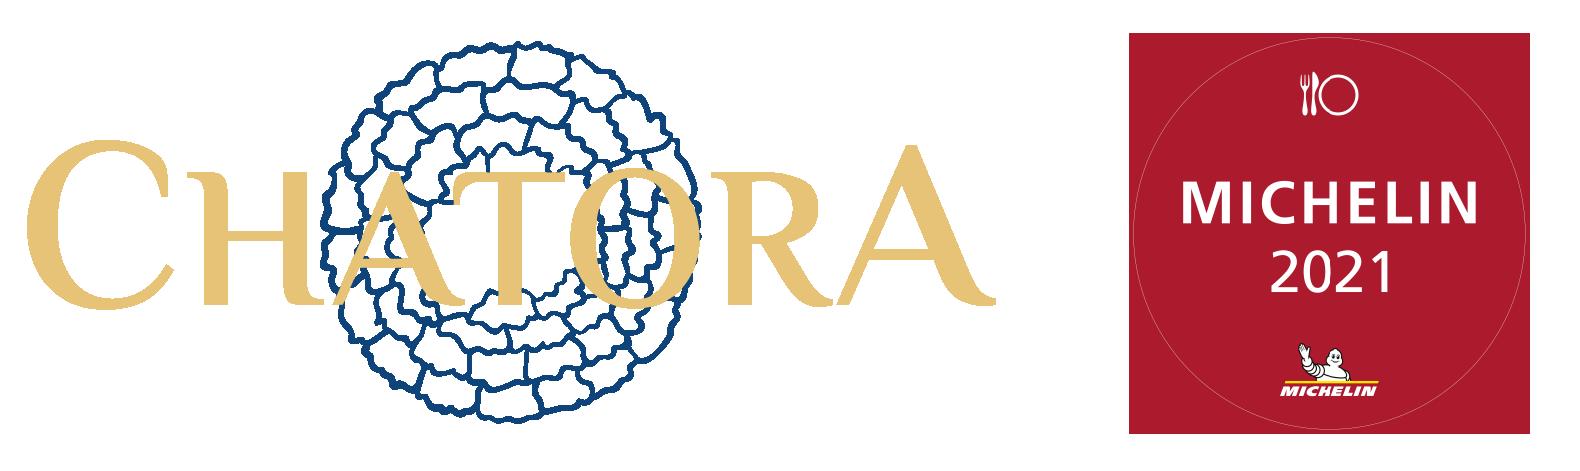 Chatora